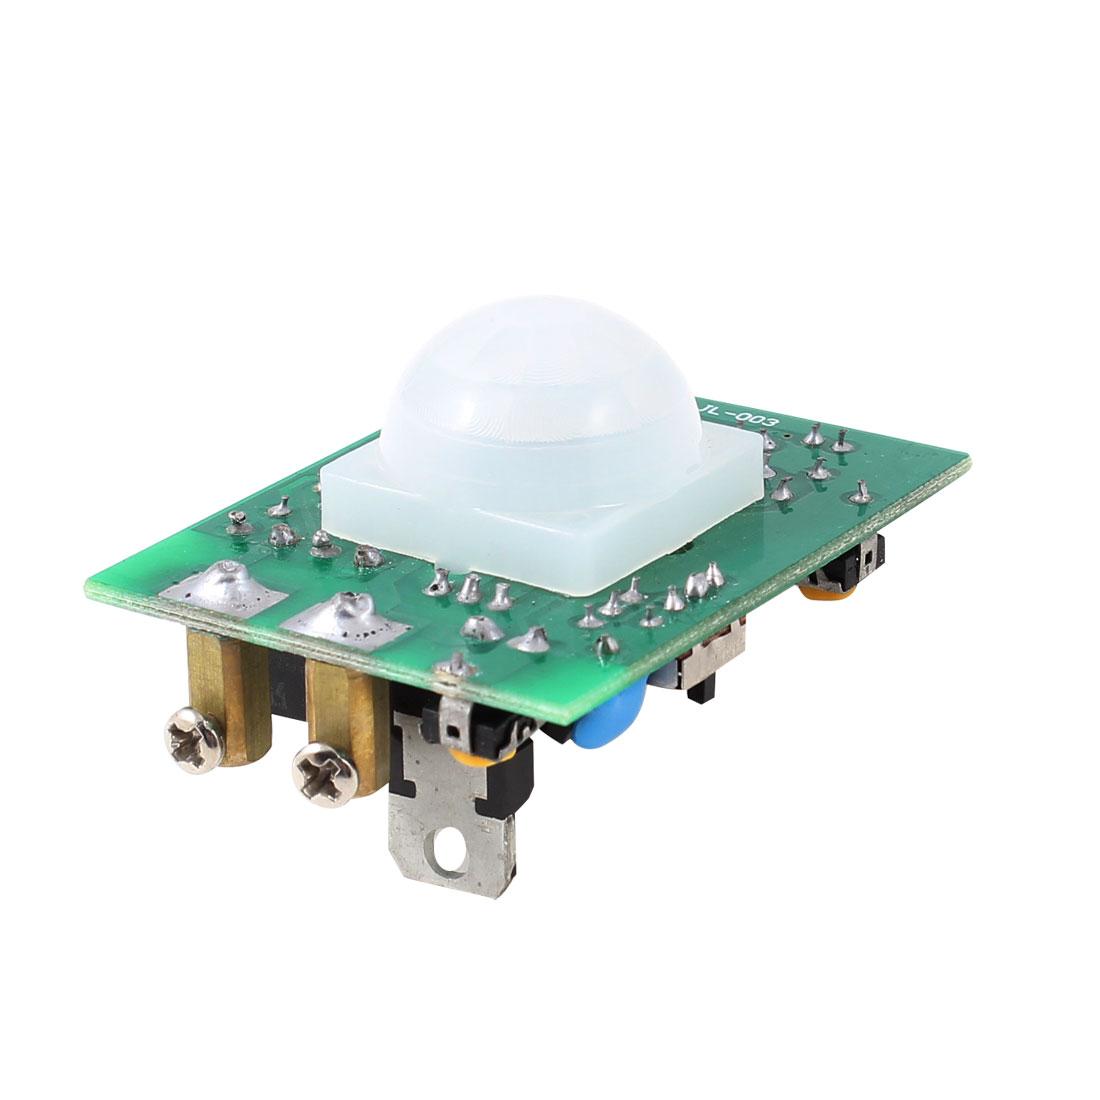 JL-003AB Wall Mounting Pyroelectric Infrared Motion Sensor Detector Module